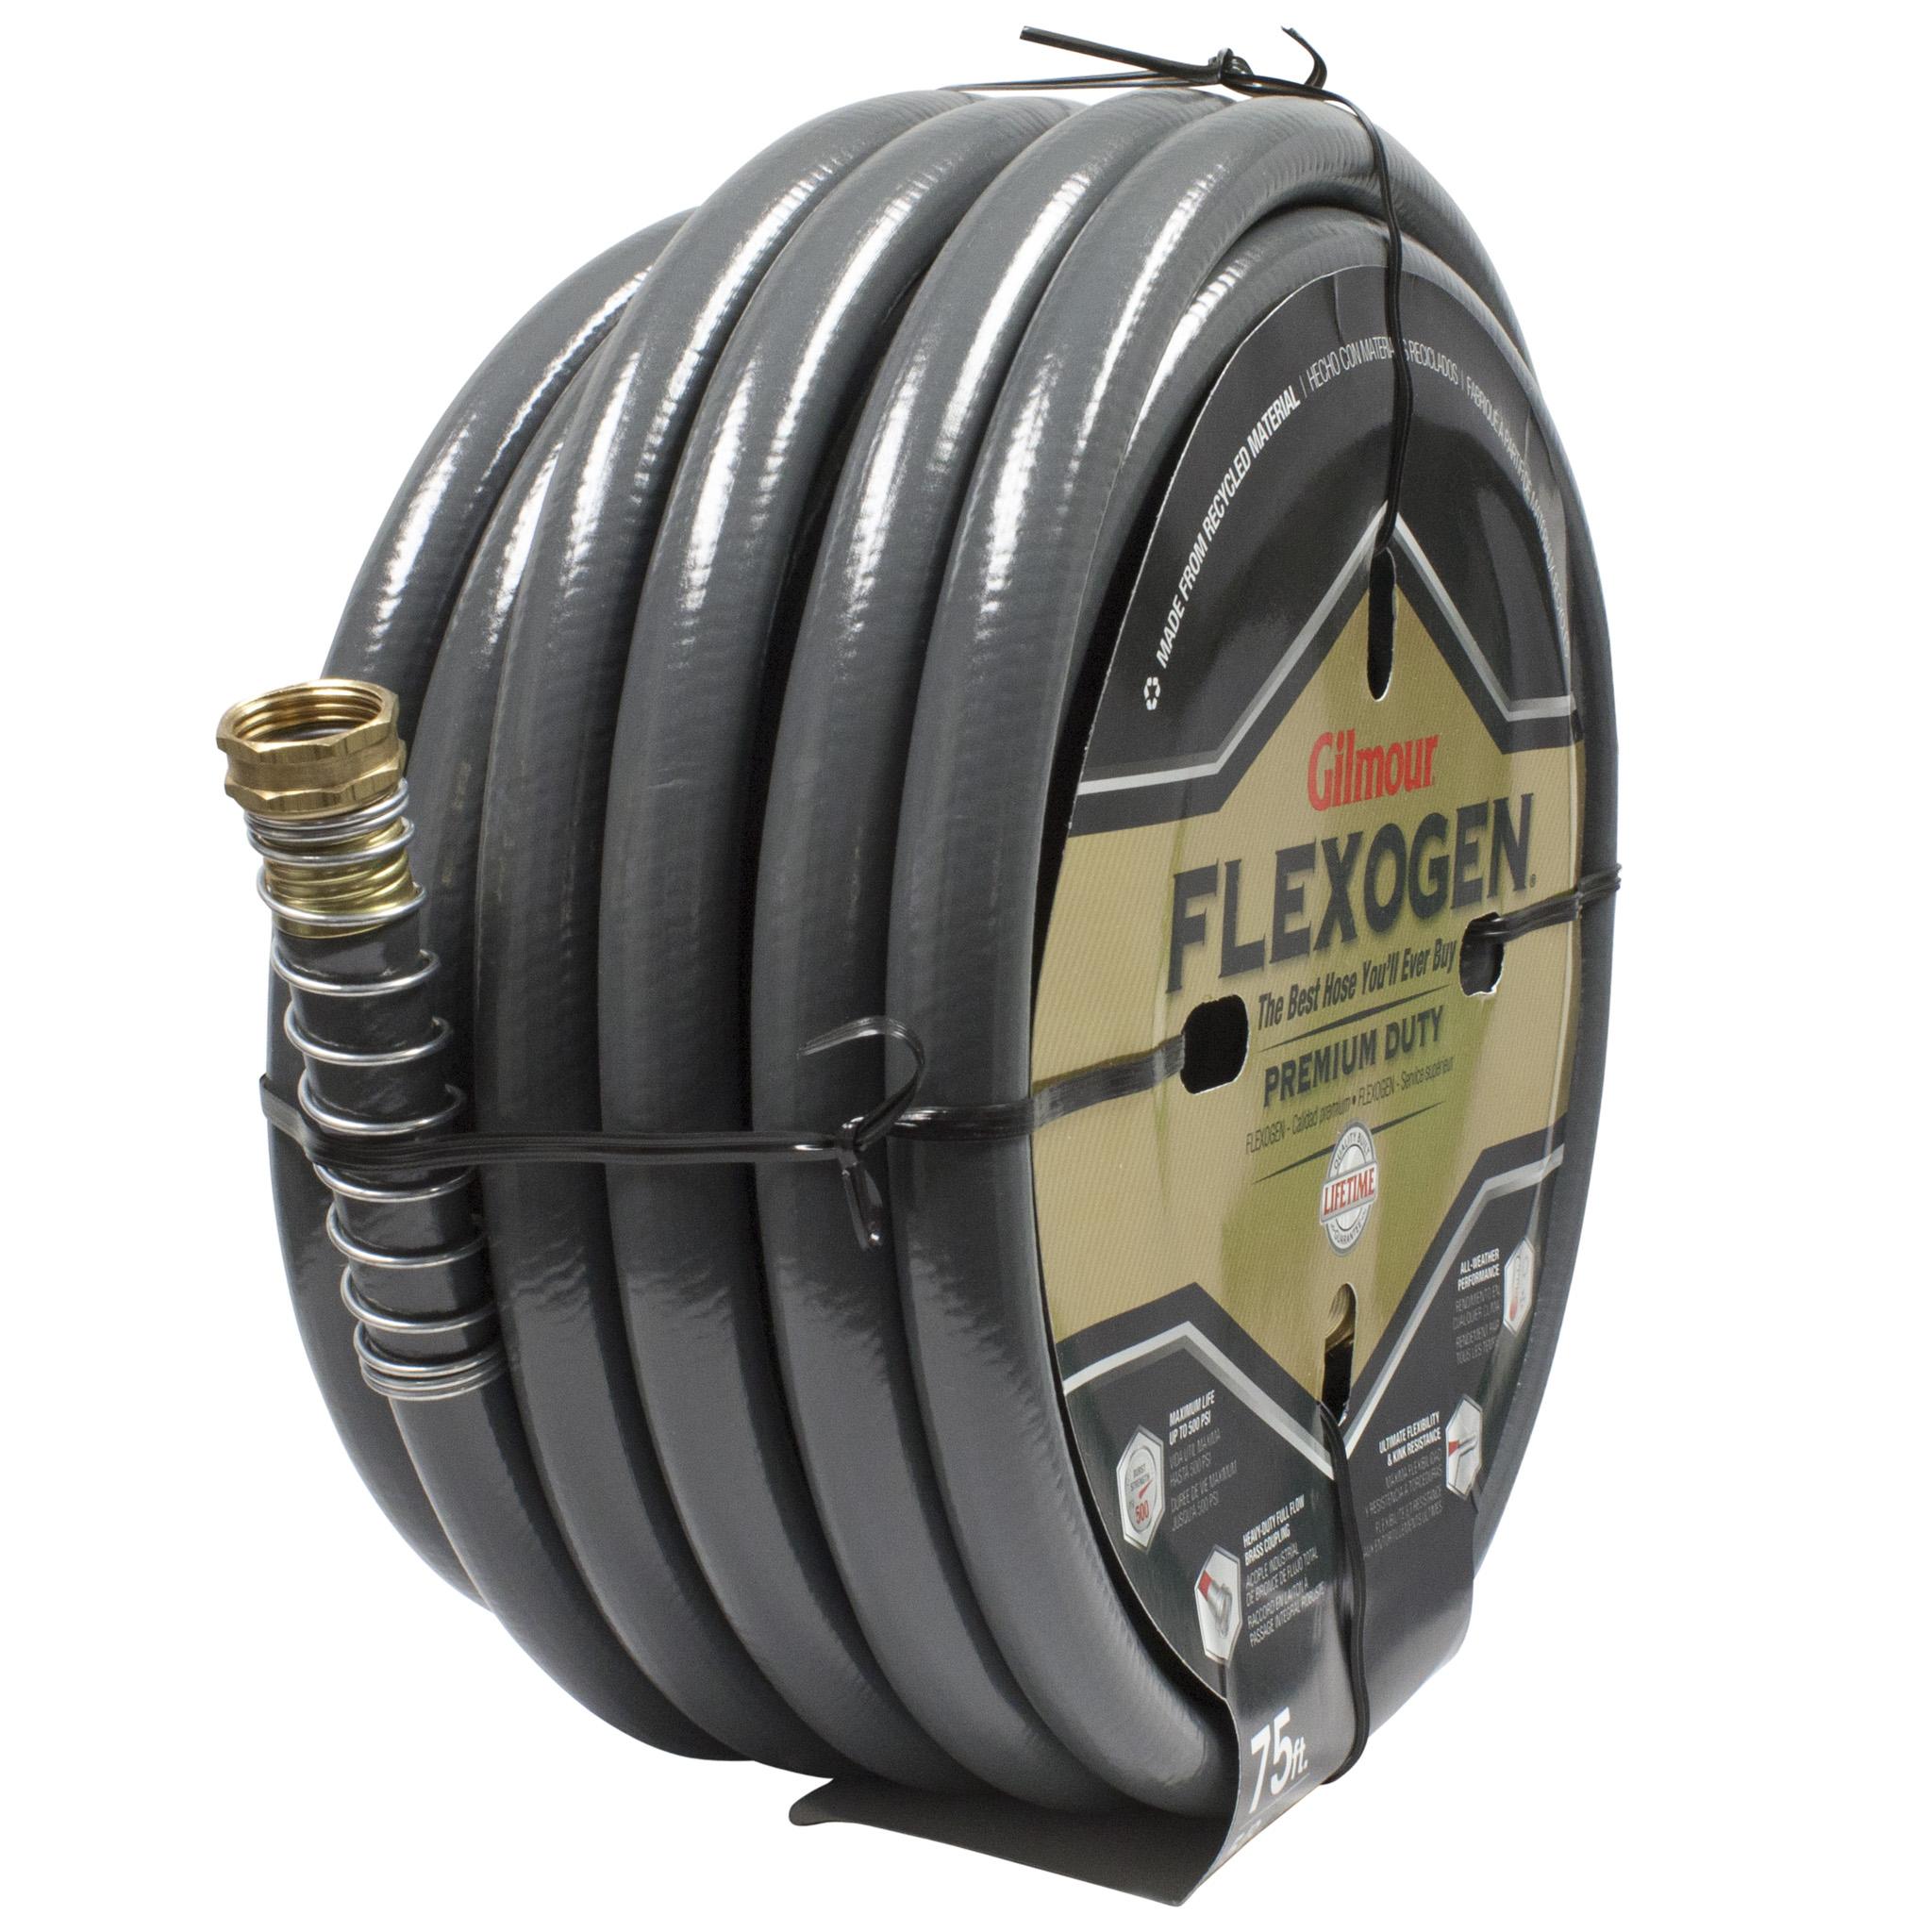 Gilmour Flexogen Premium Garden Hose 58 x 75